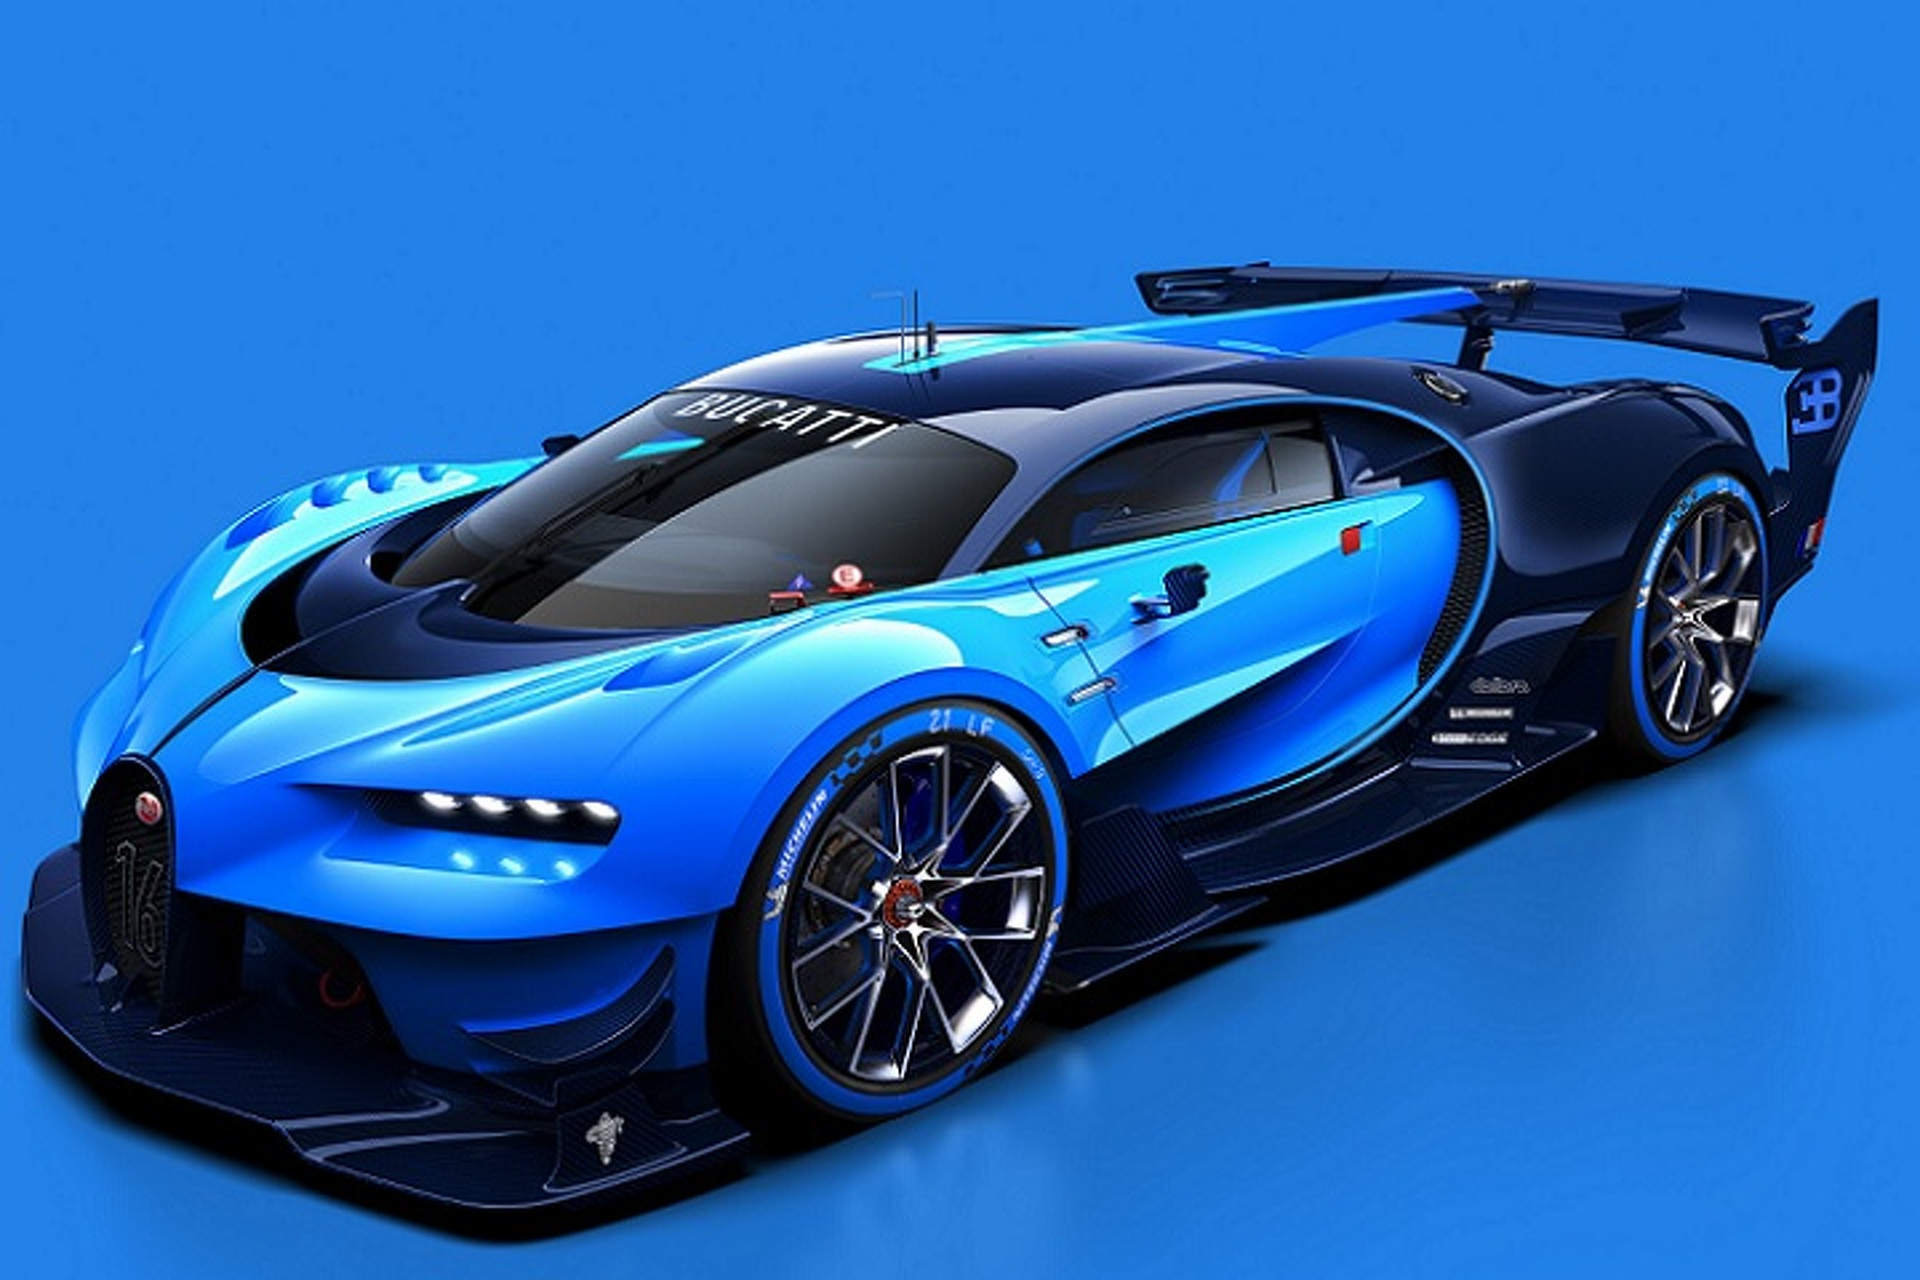 Volkswagen: Cheat Software May Not Be Illegal in EU, Bugatti Successor in Question